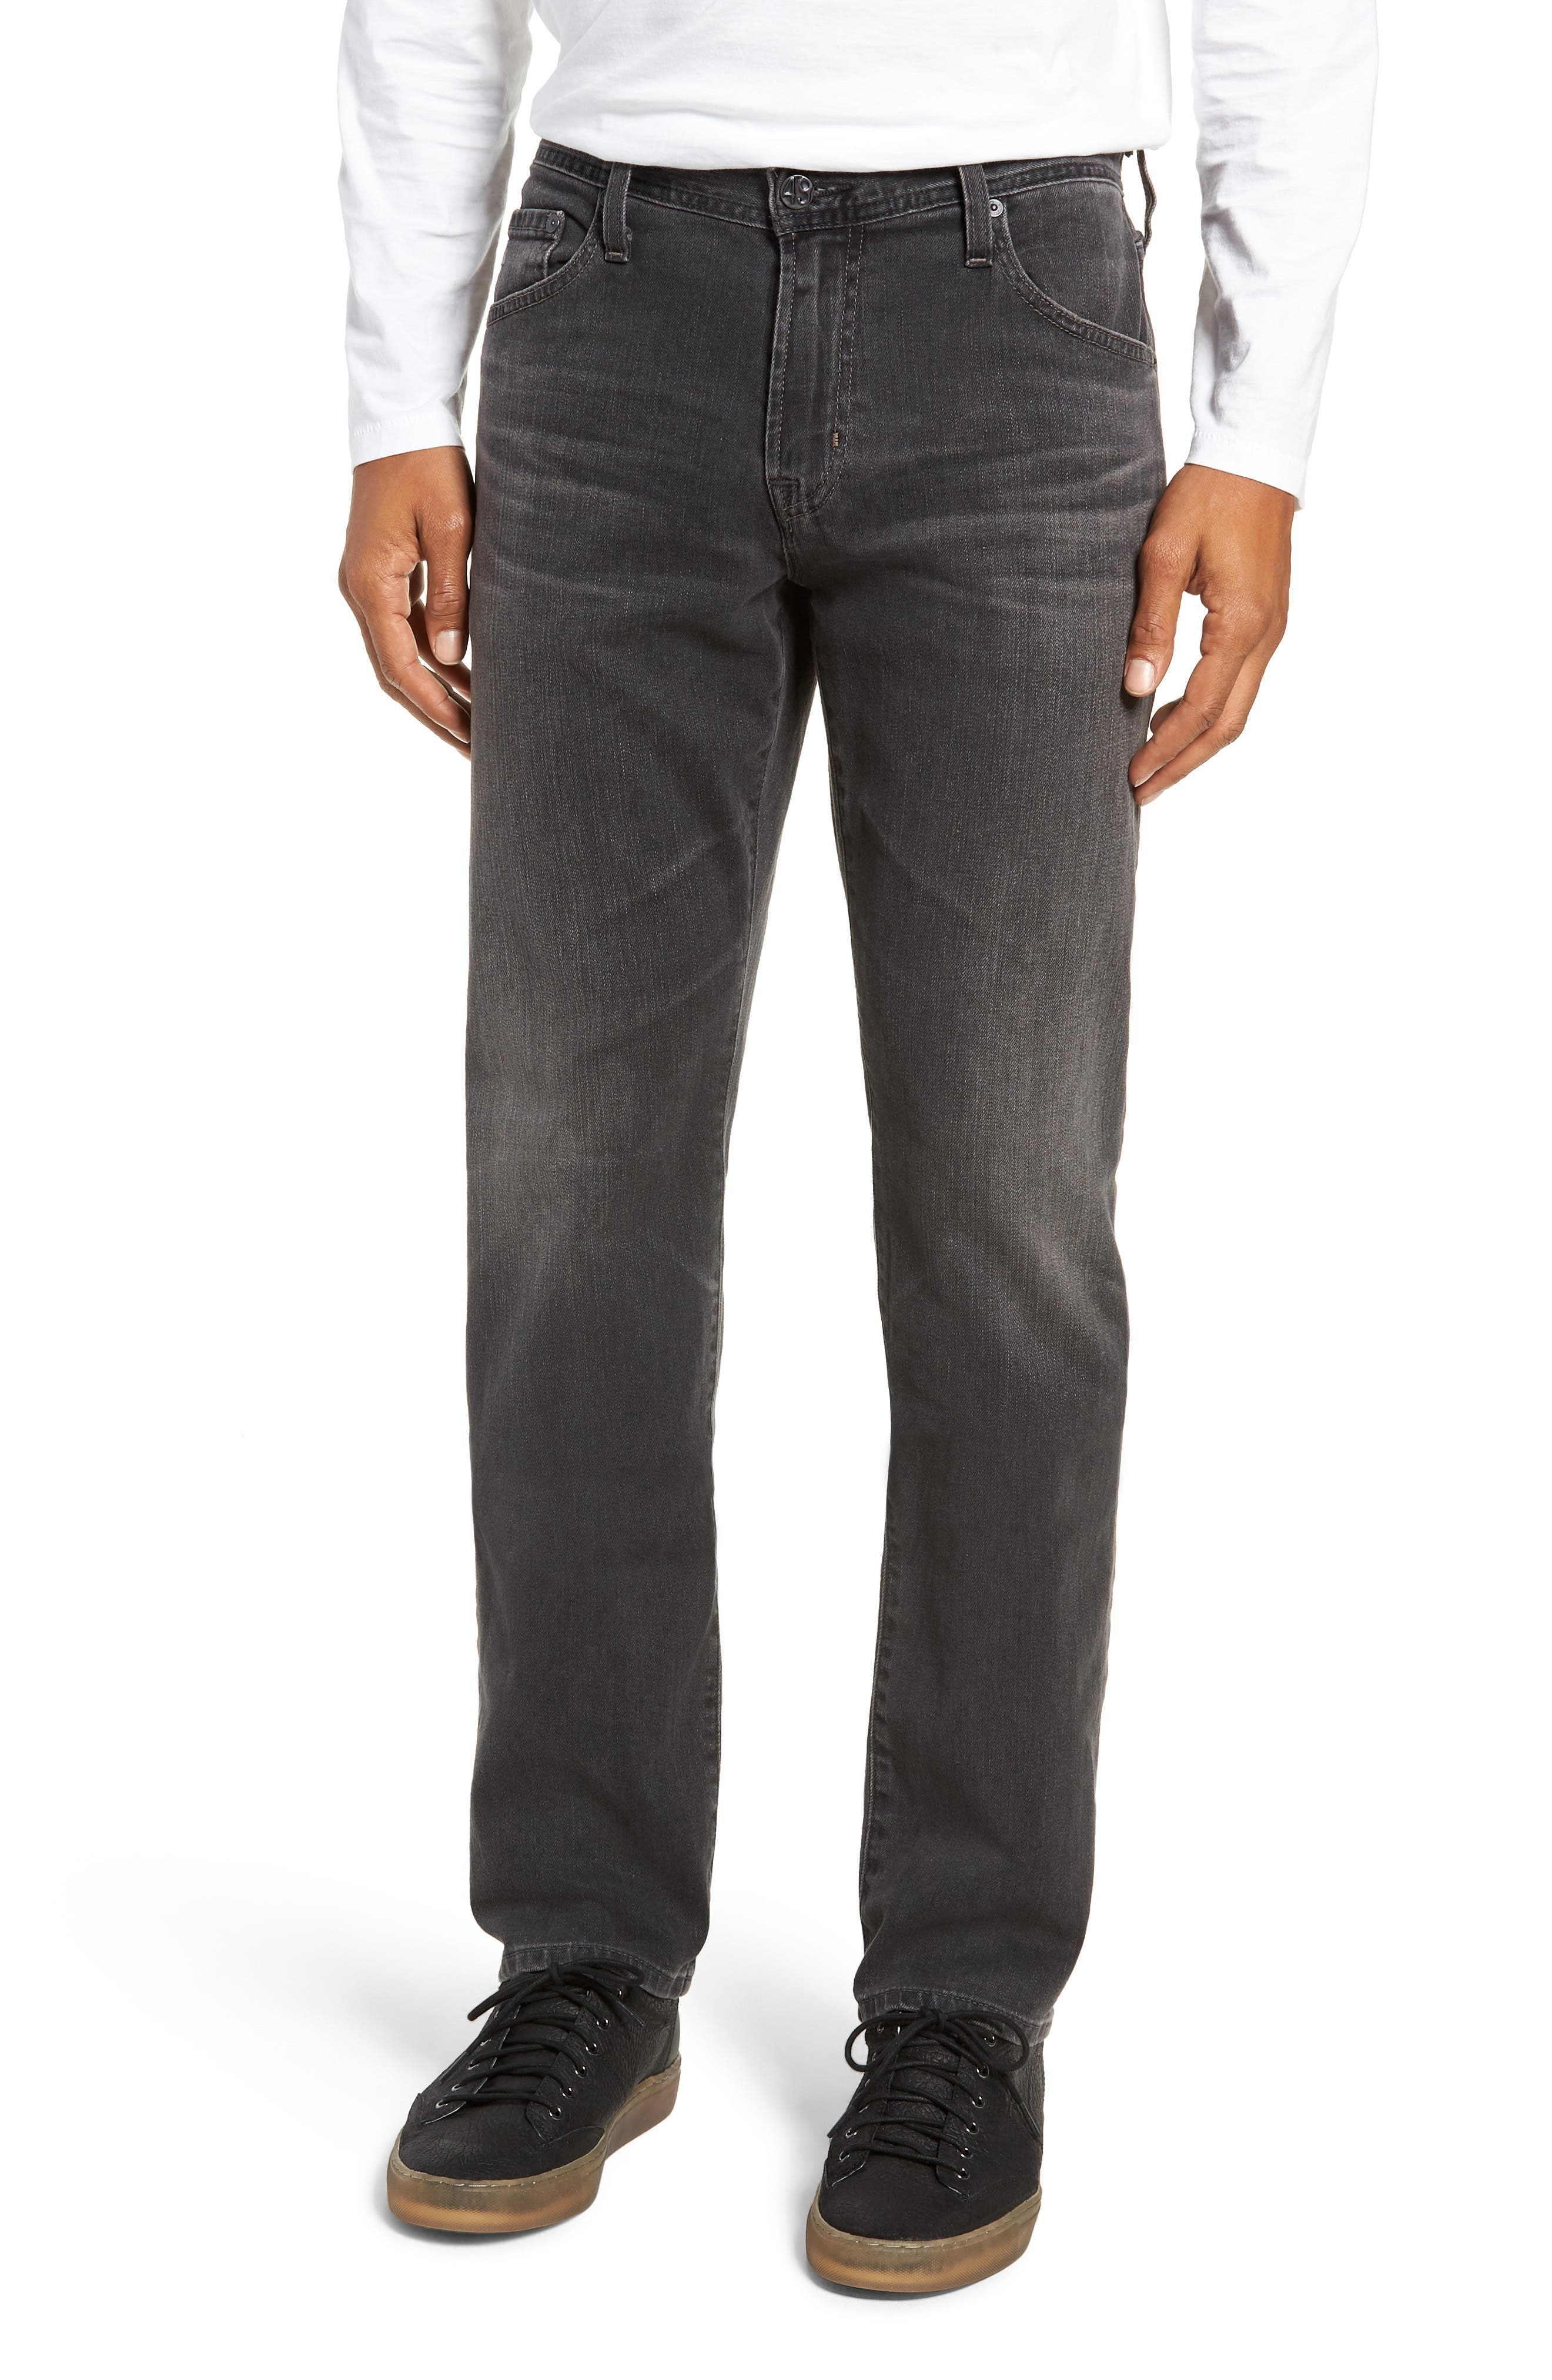 Graduate Slim Straight Leg Jeans,                         Main,                         color, 6 YEARS ARCADE